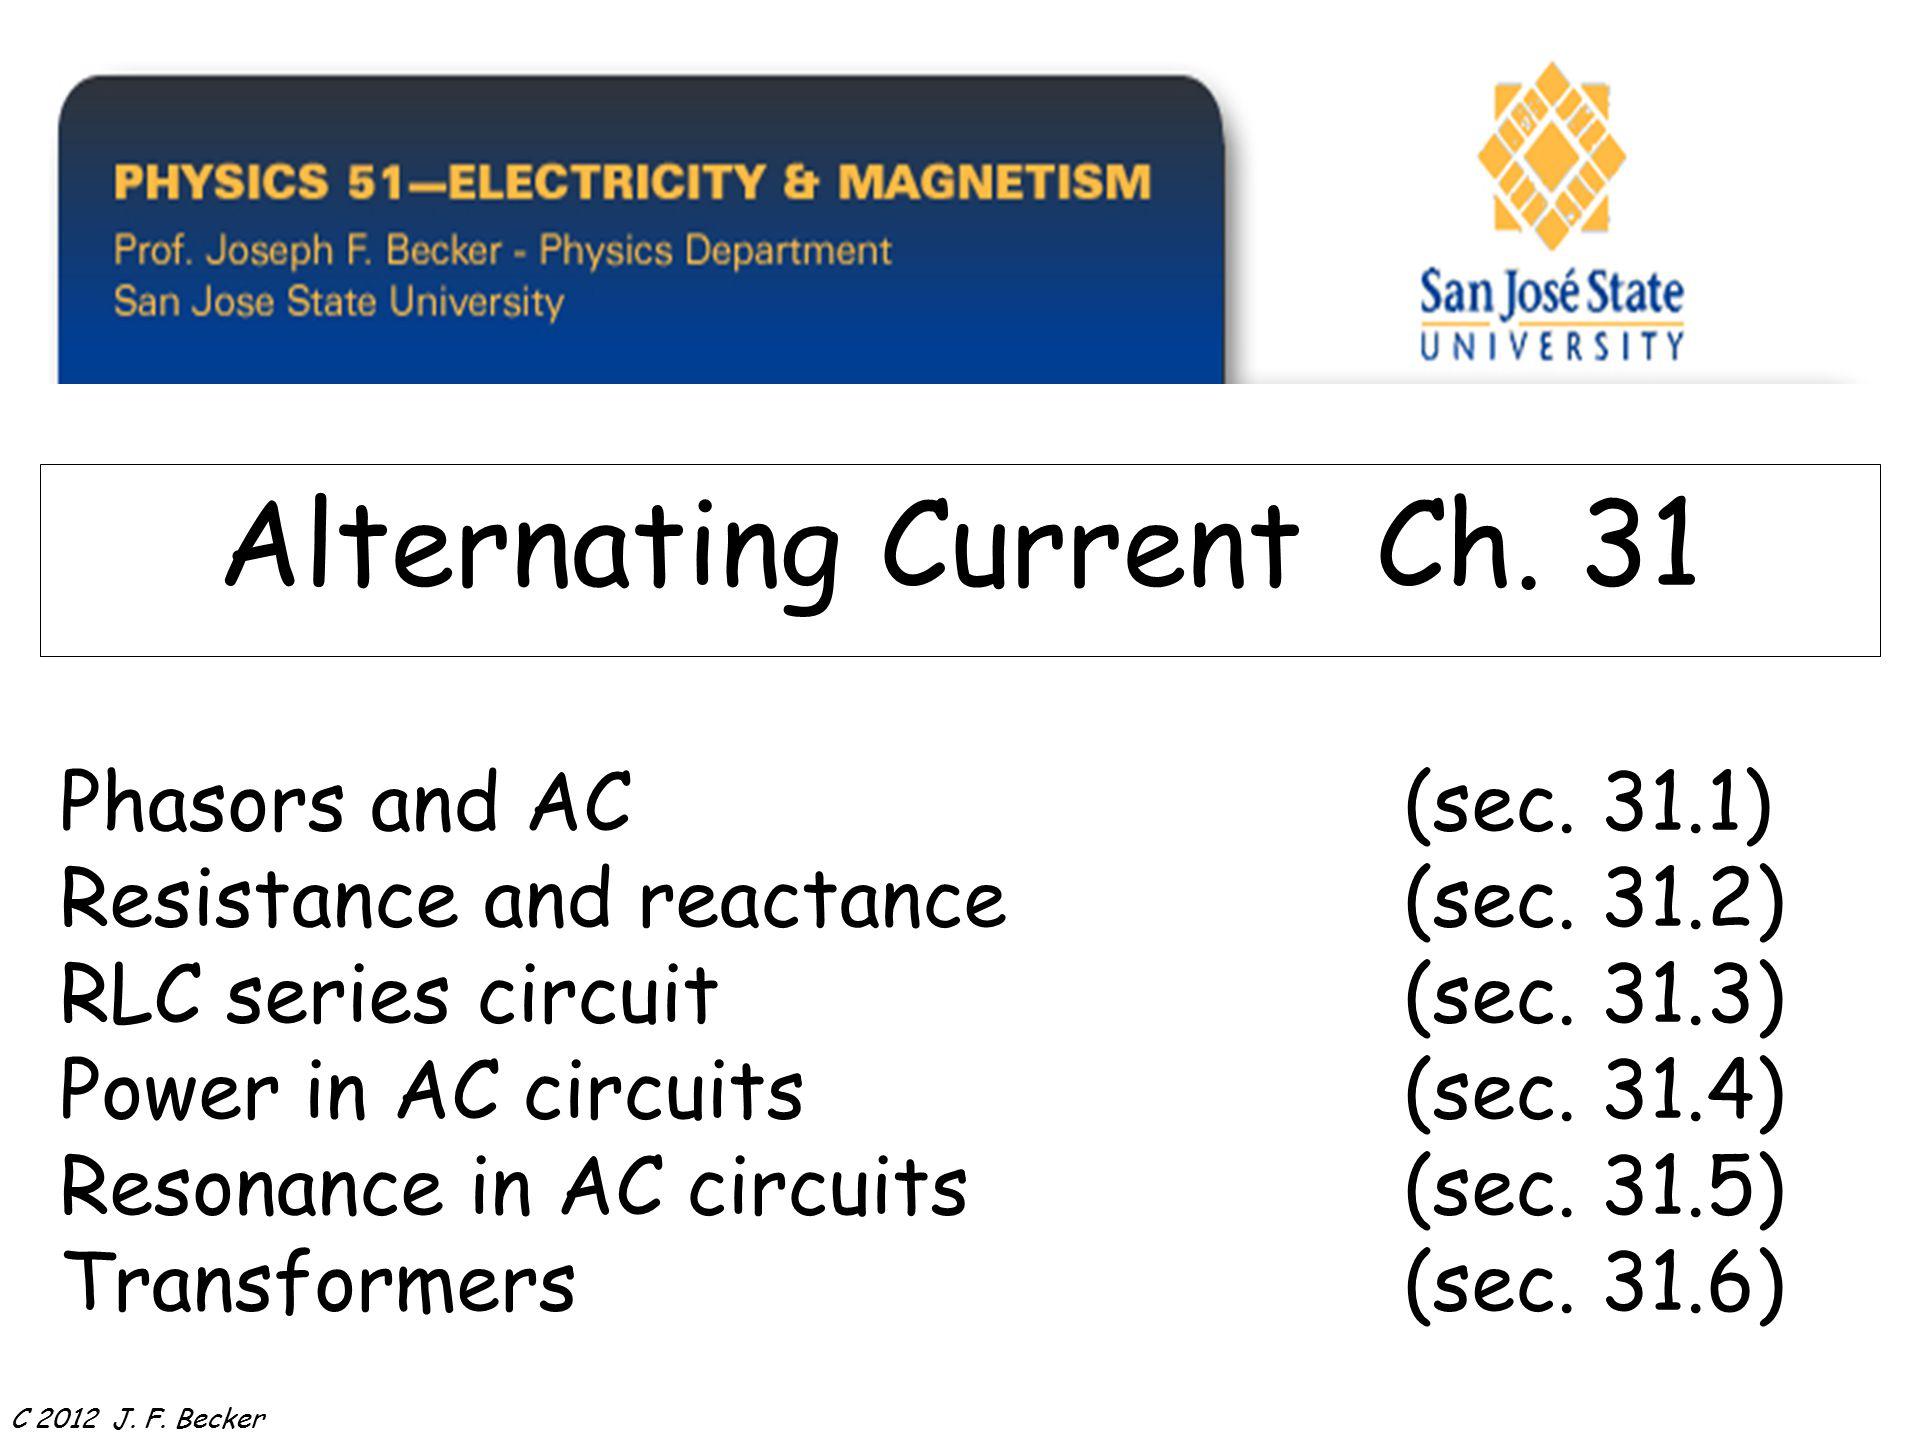 Phasors And Acsec 311 Resistance Reactancesec 312 Rlc Rl Series Ac Circuit